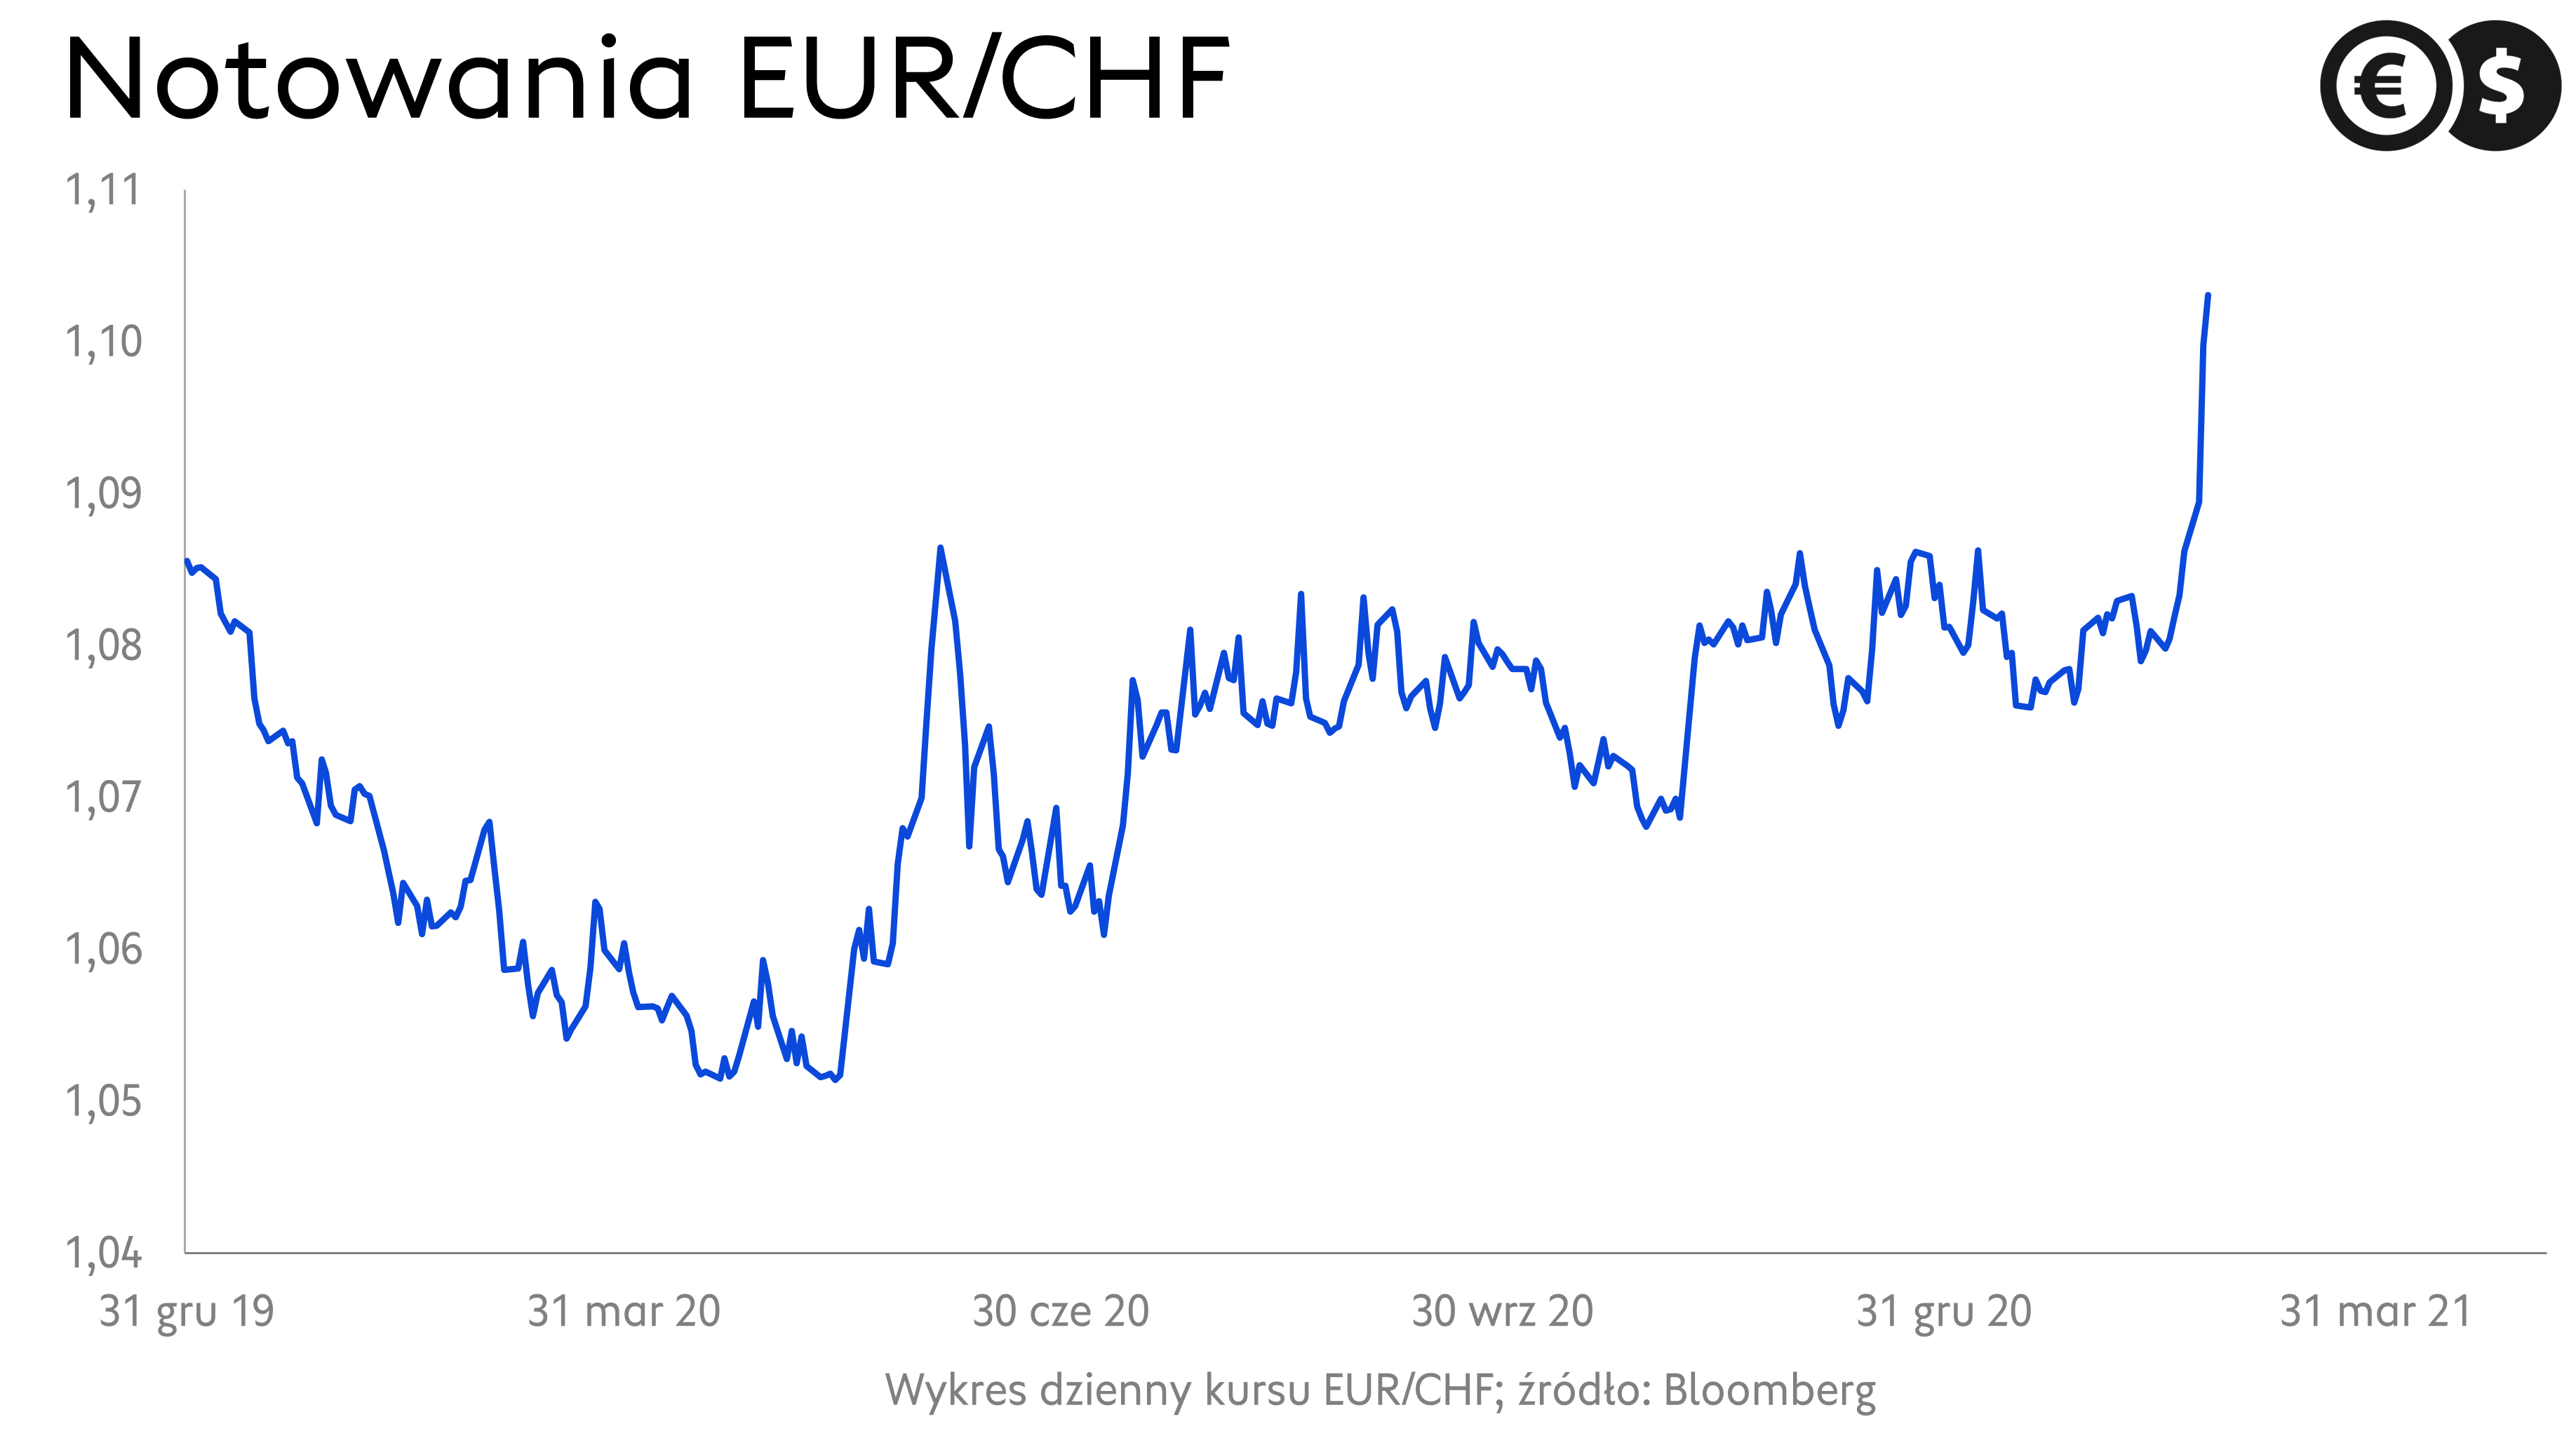 Notowania EUR/CHF